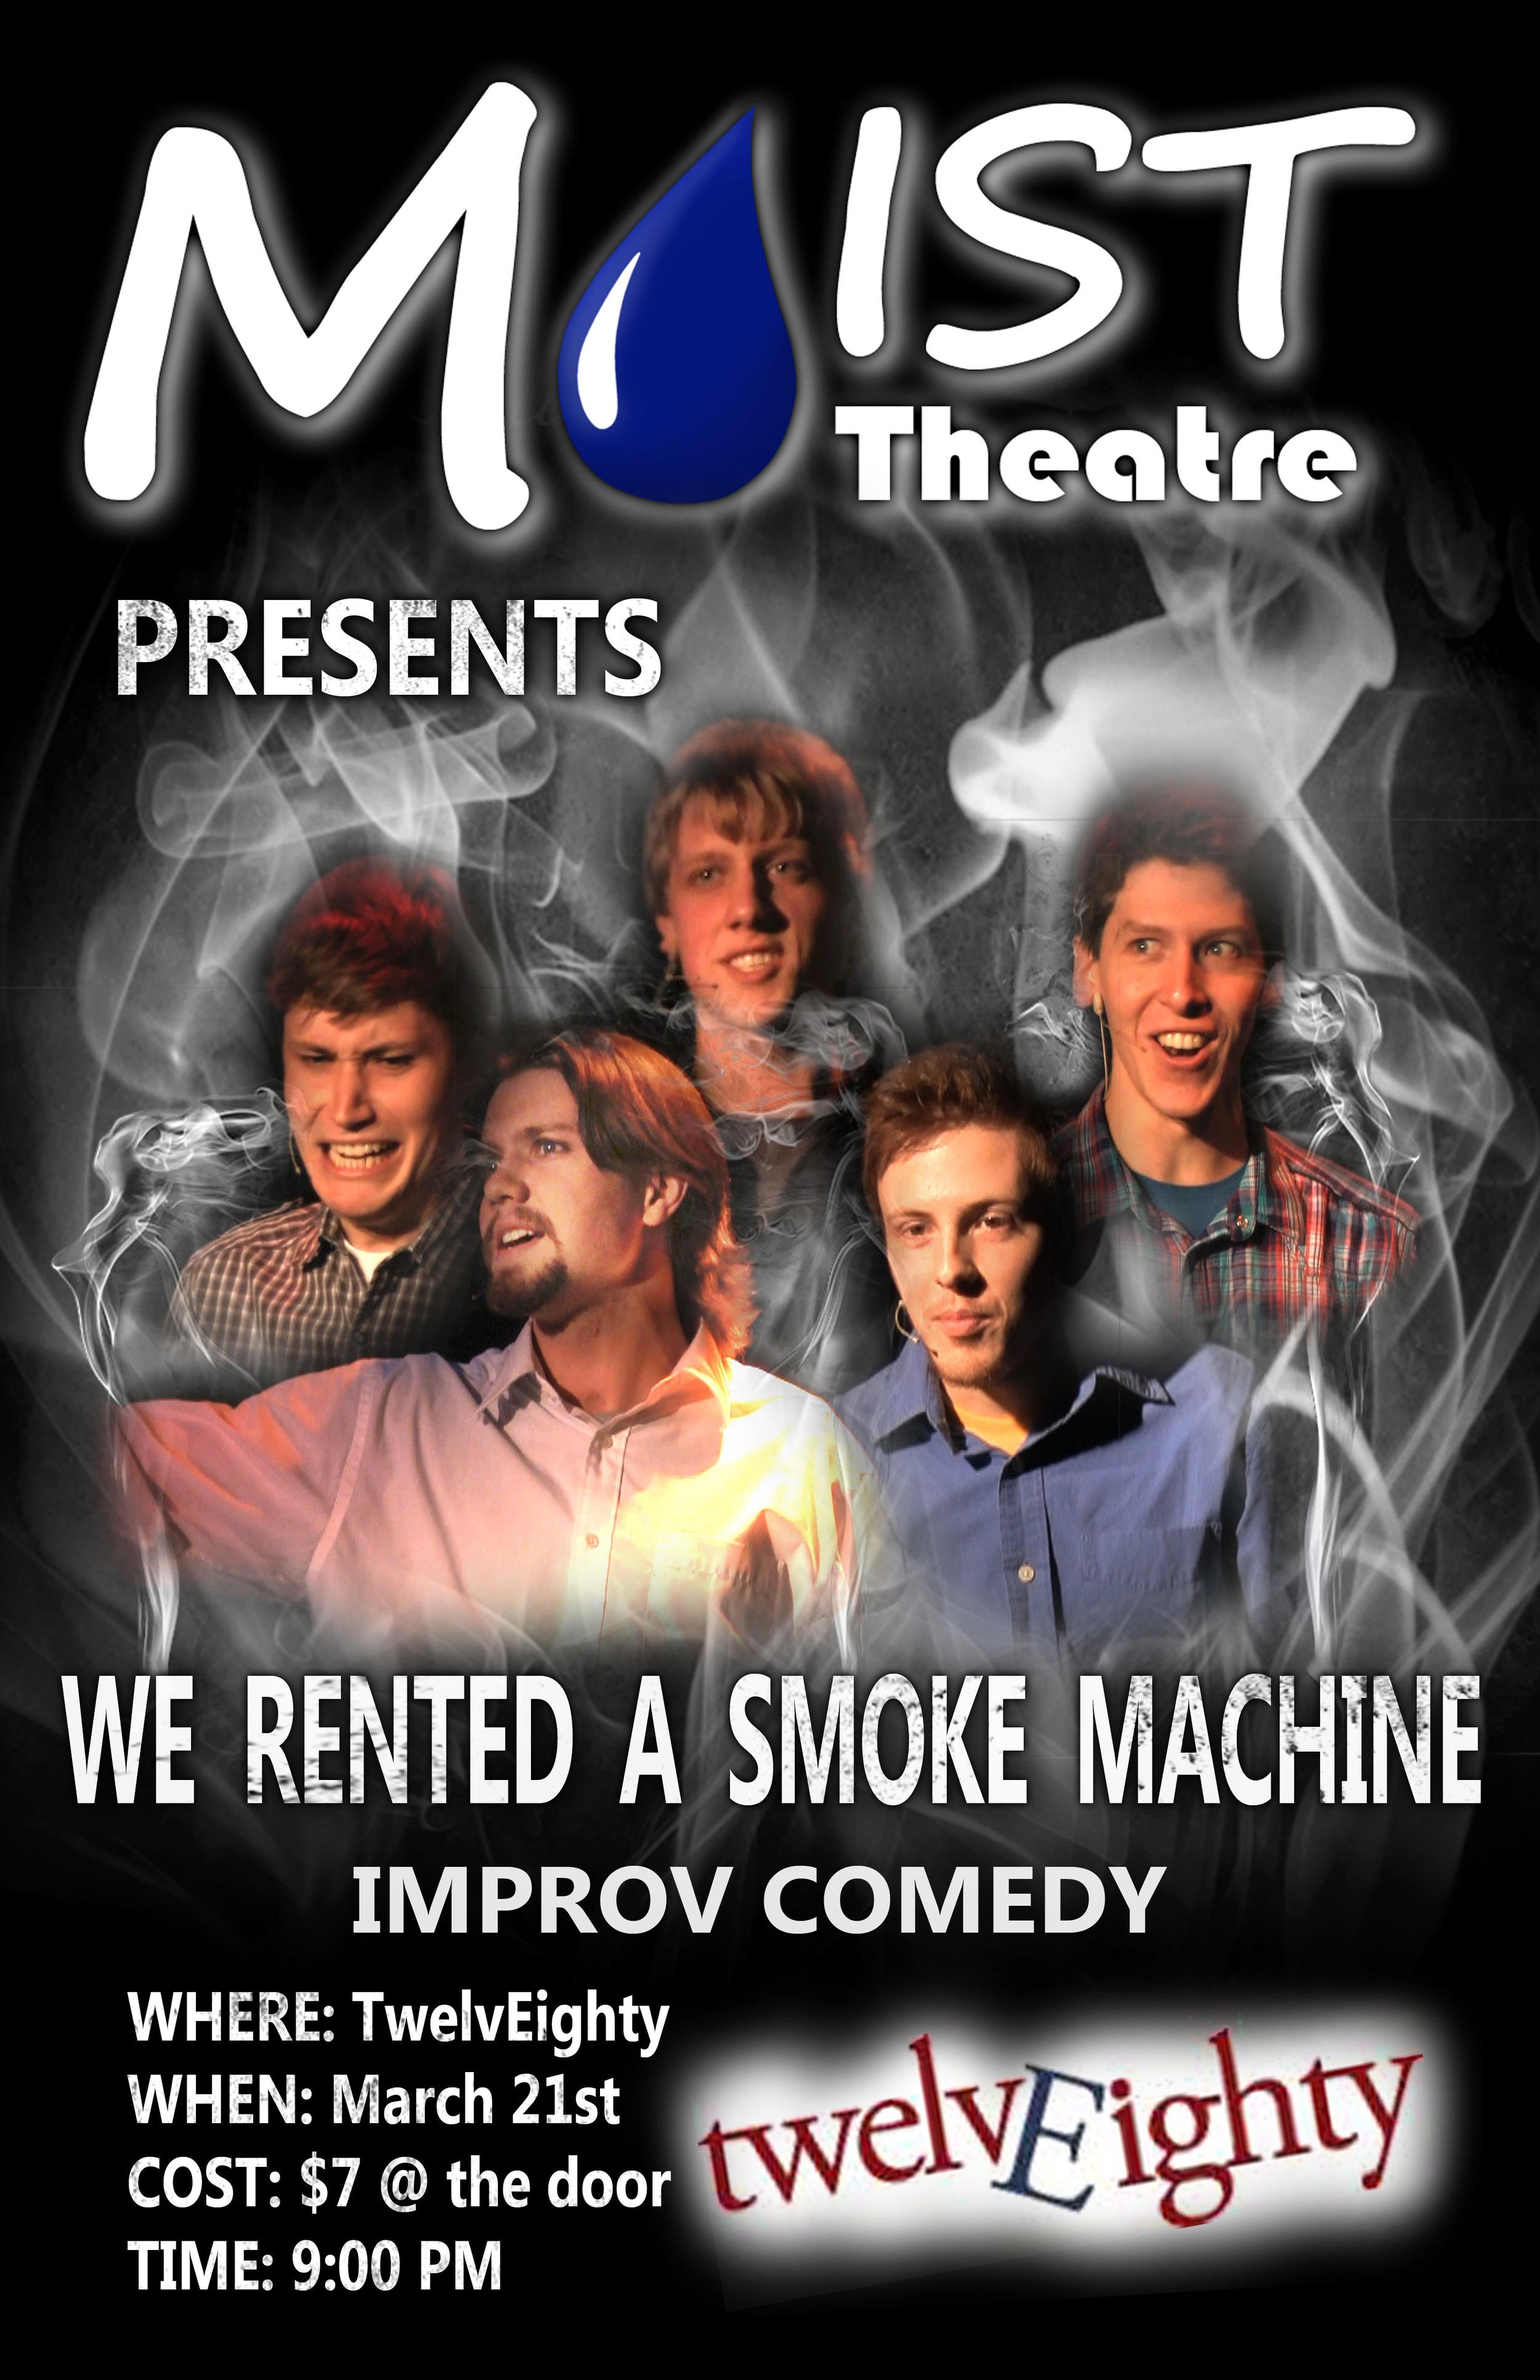 Poster We Rented a Smoke machine_FINAL FINAL.jpg